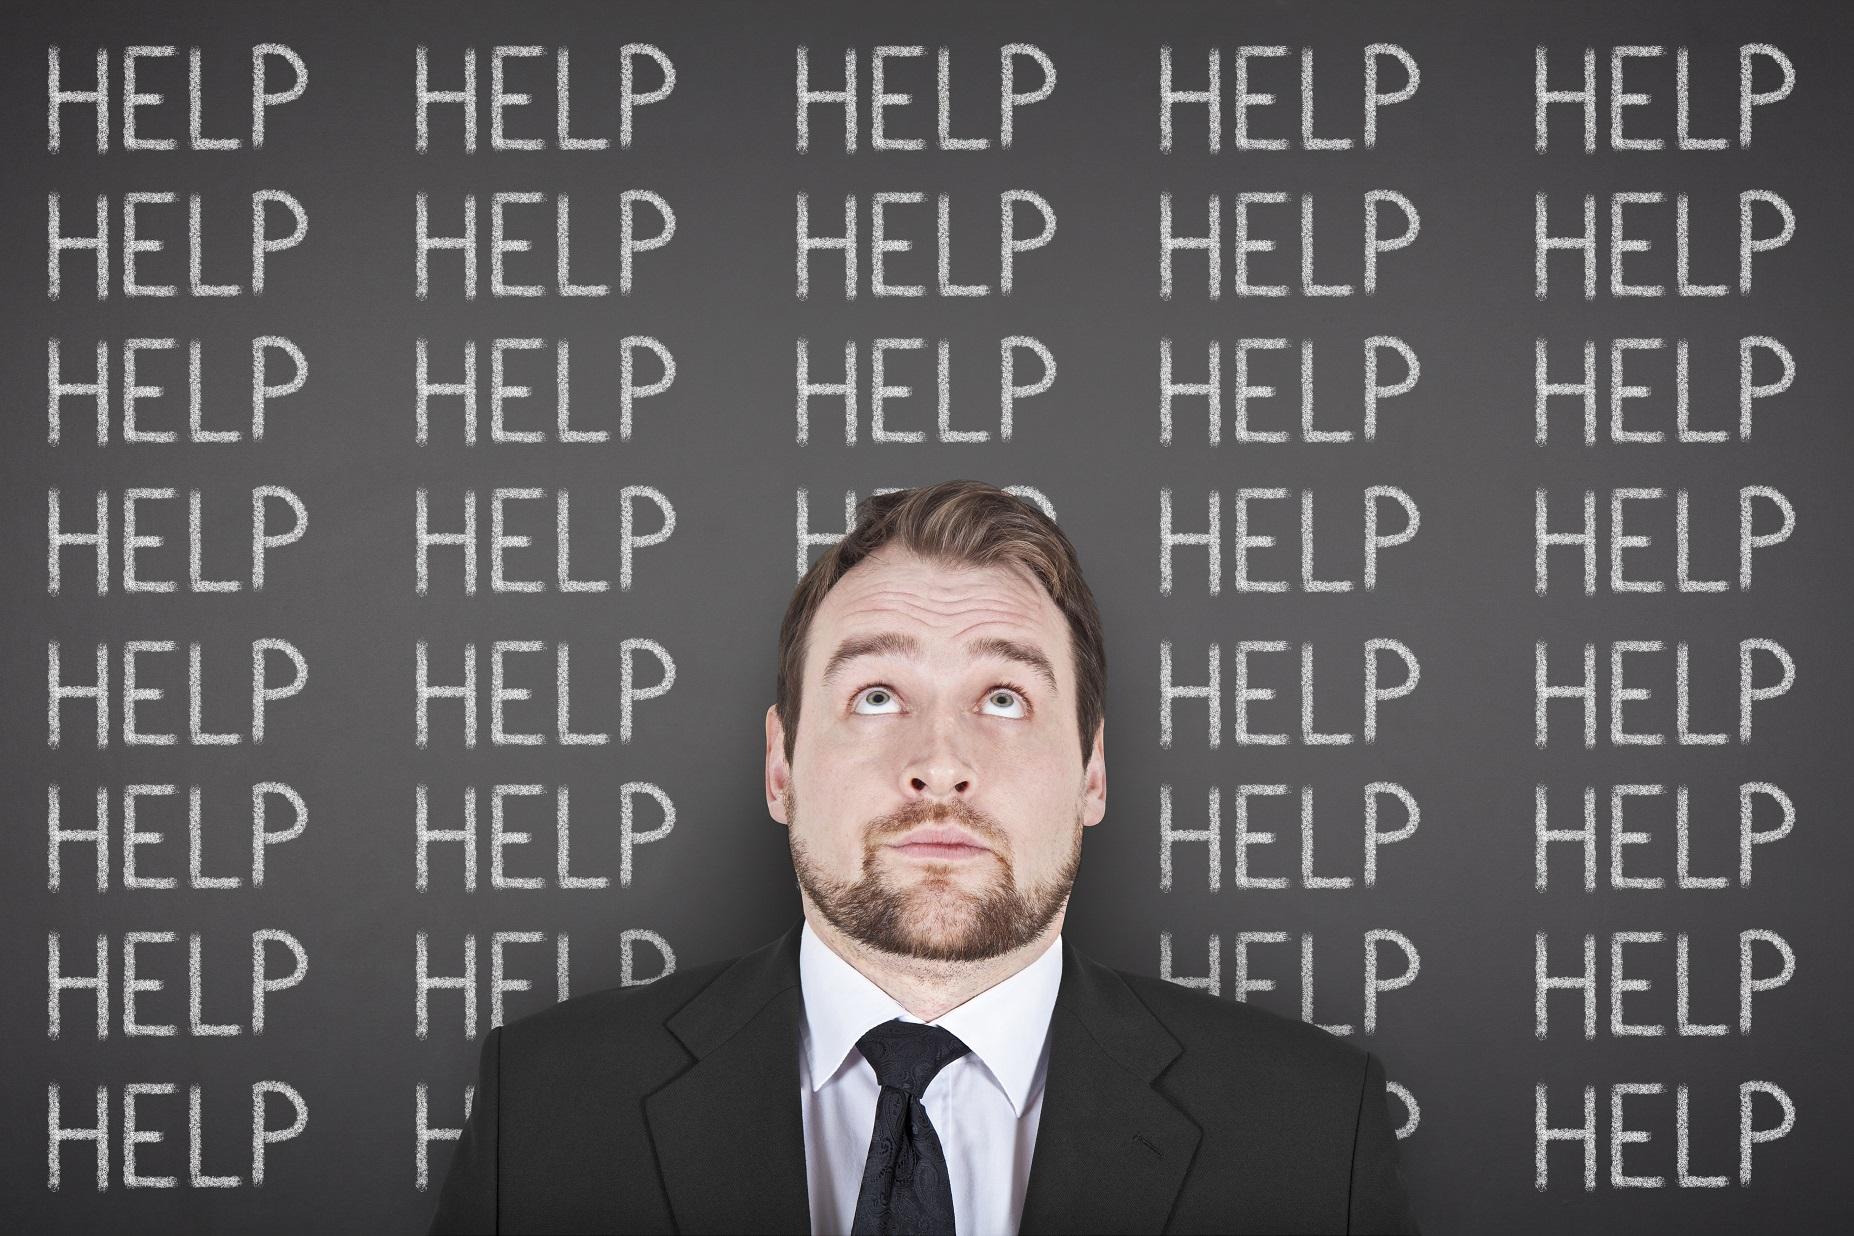 Teacher stress 'causing relationships to break down' | News